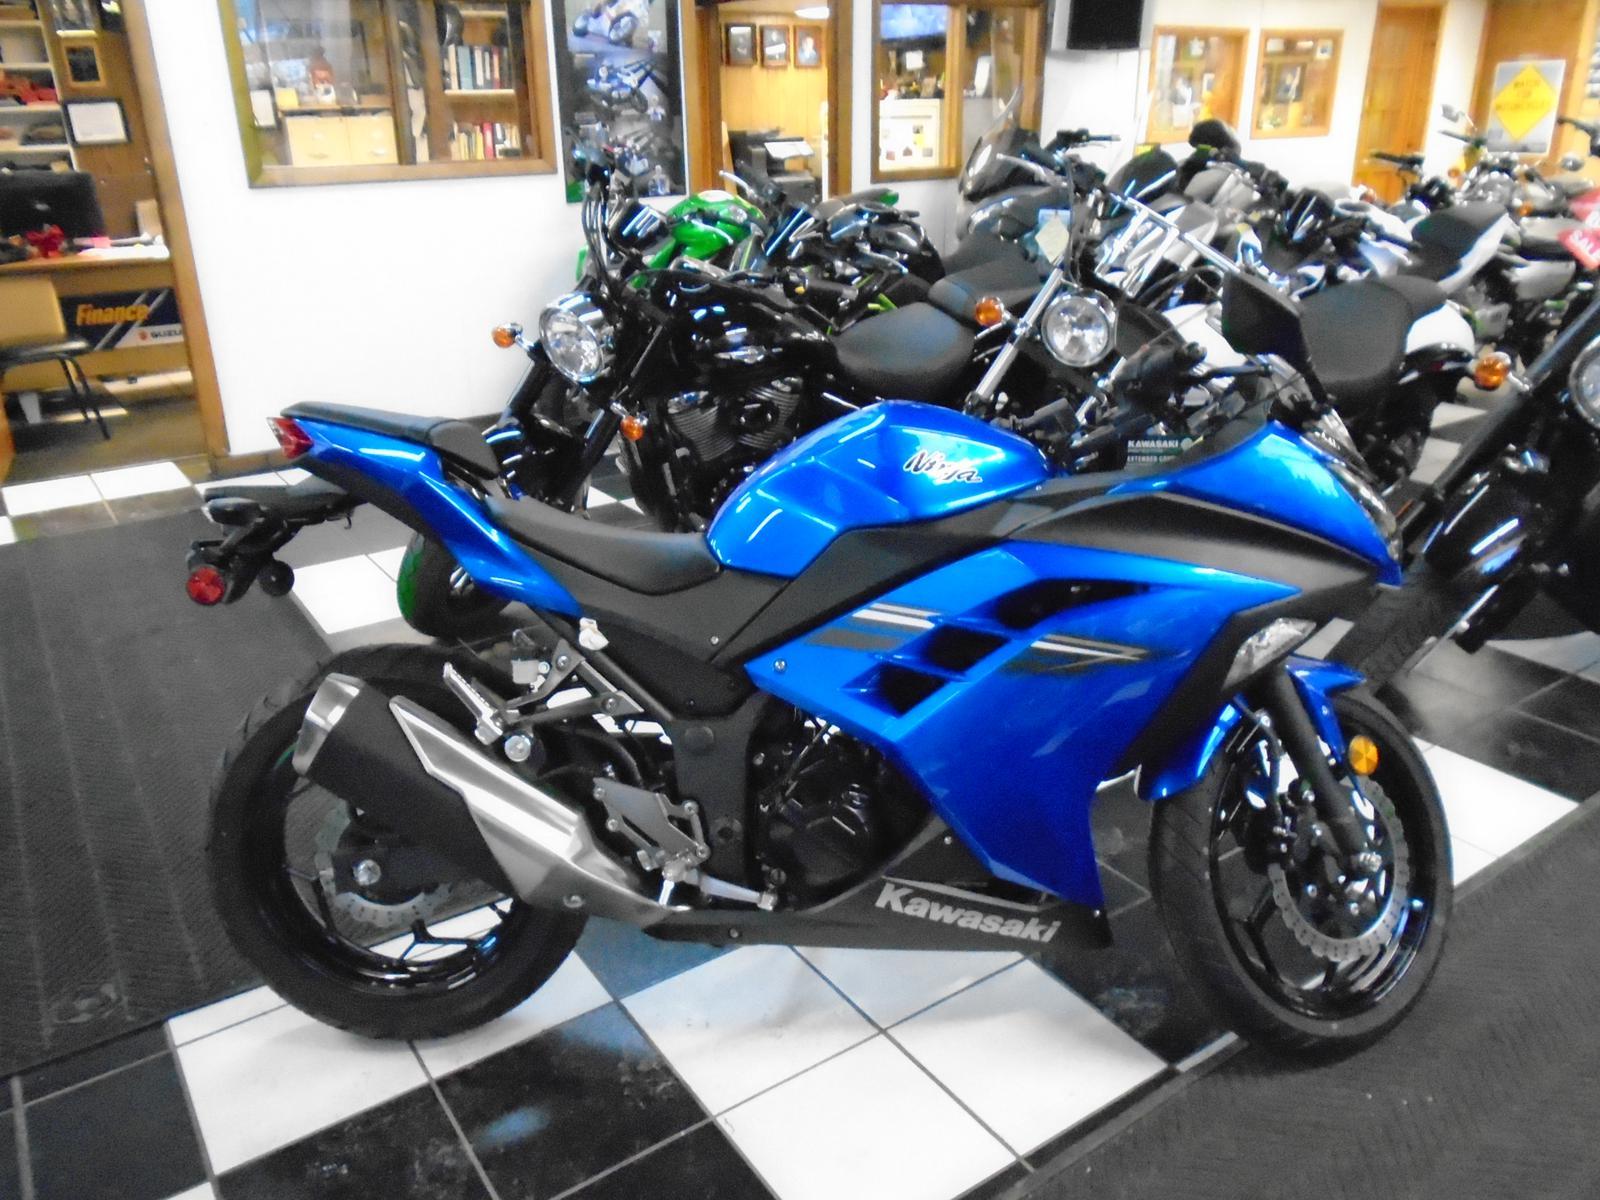 2017 Kawasaki Ninja 300 For Sale In Bridgeport Wv Leesons Import